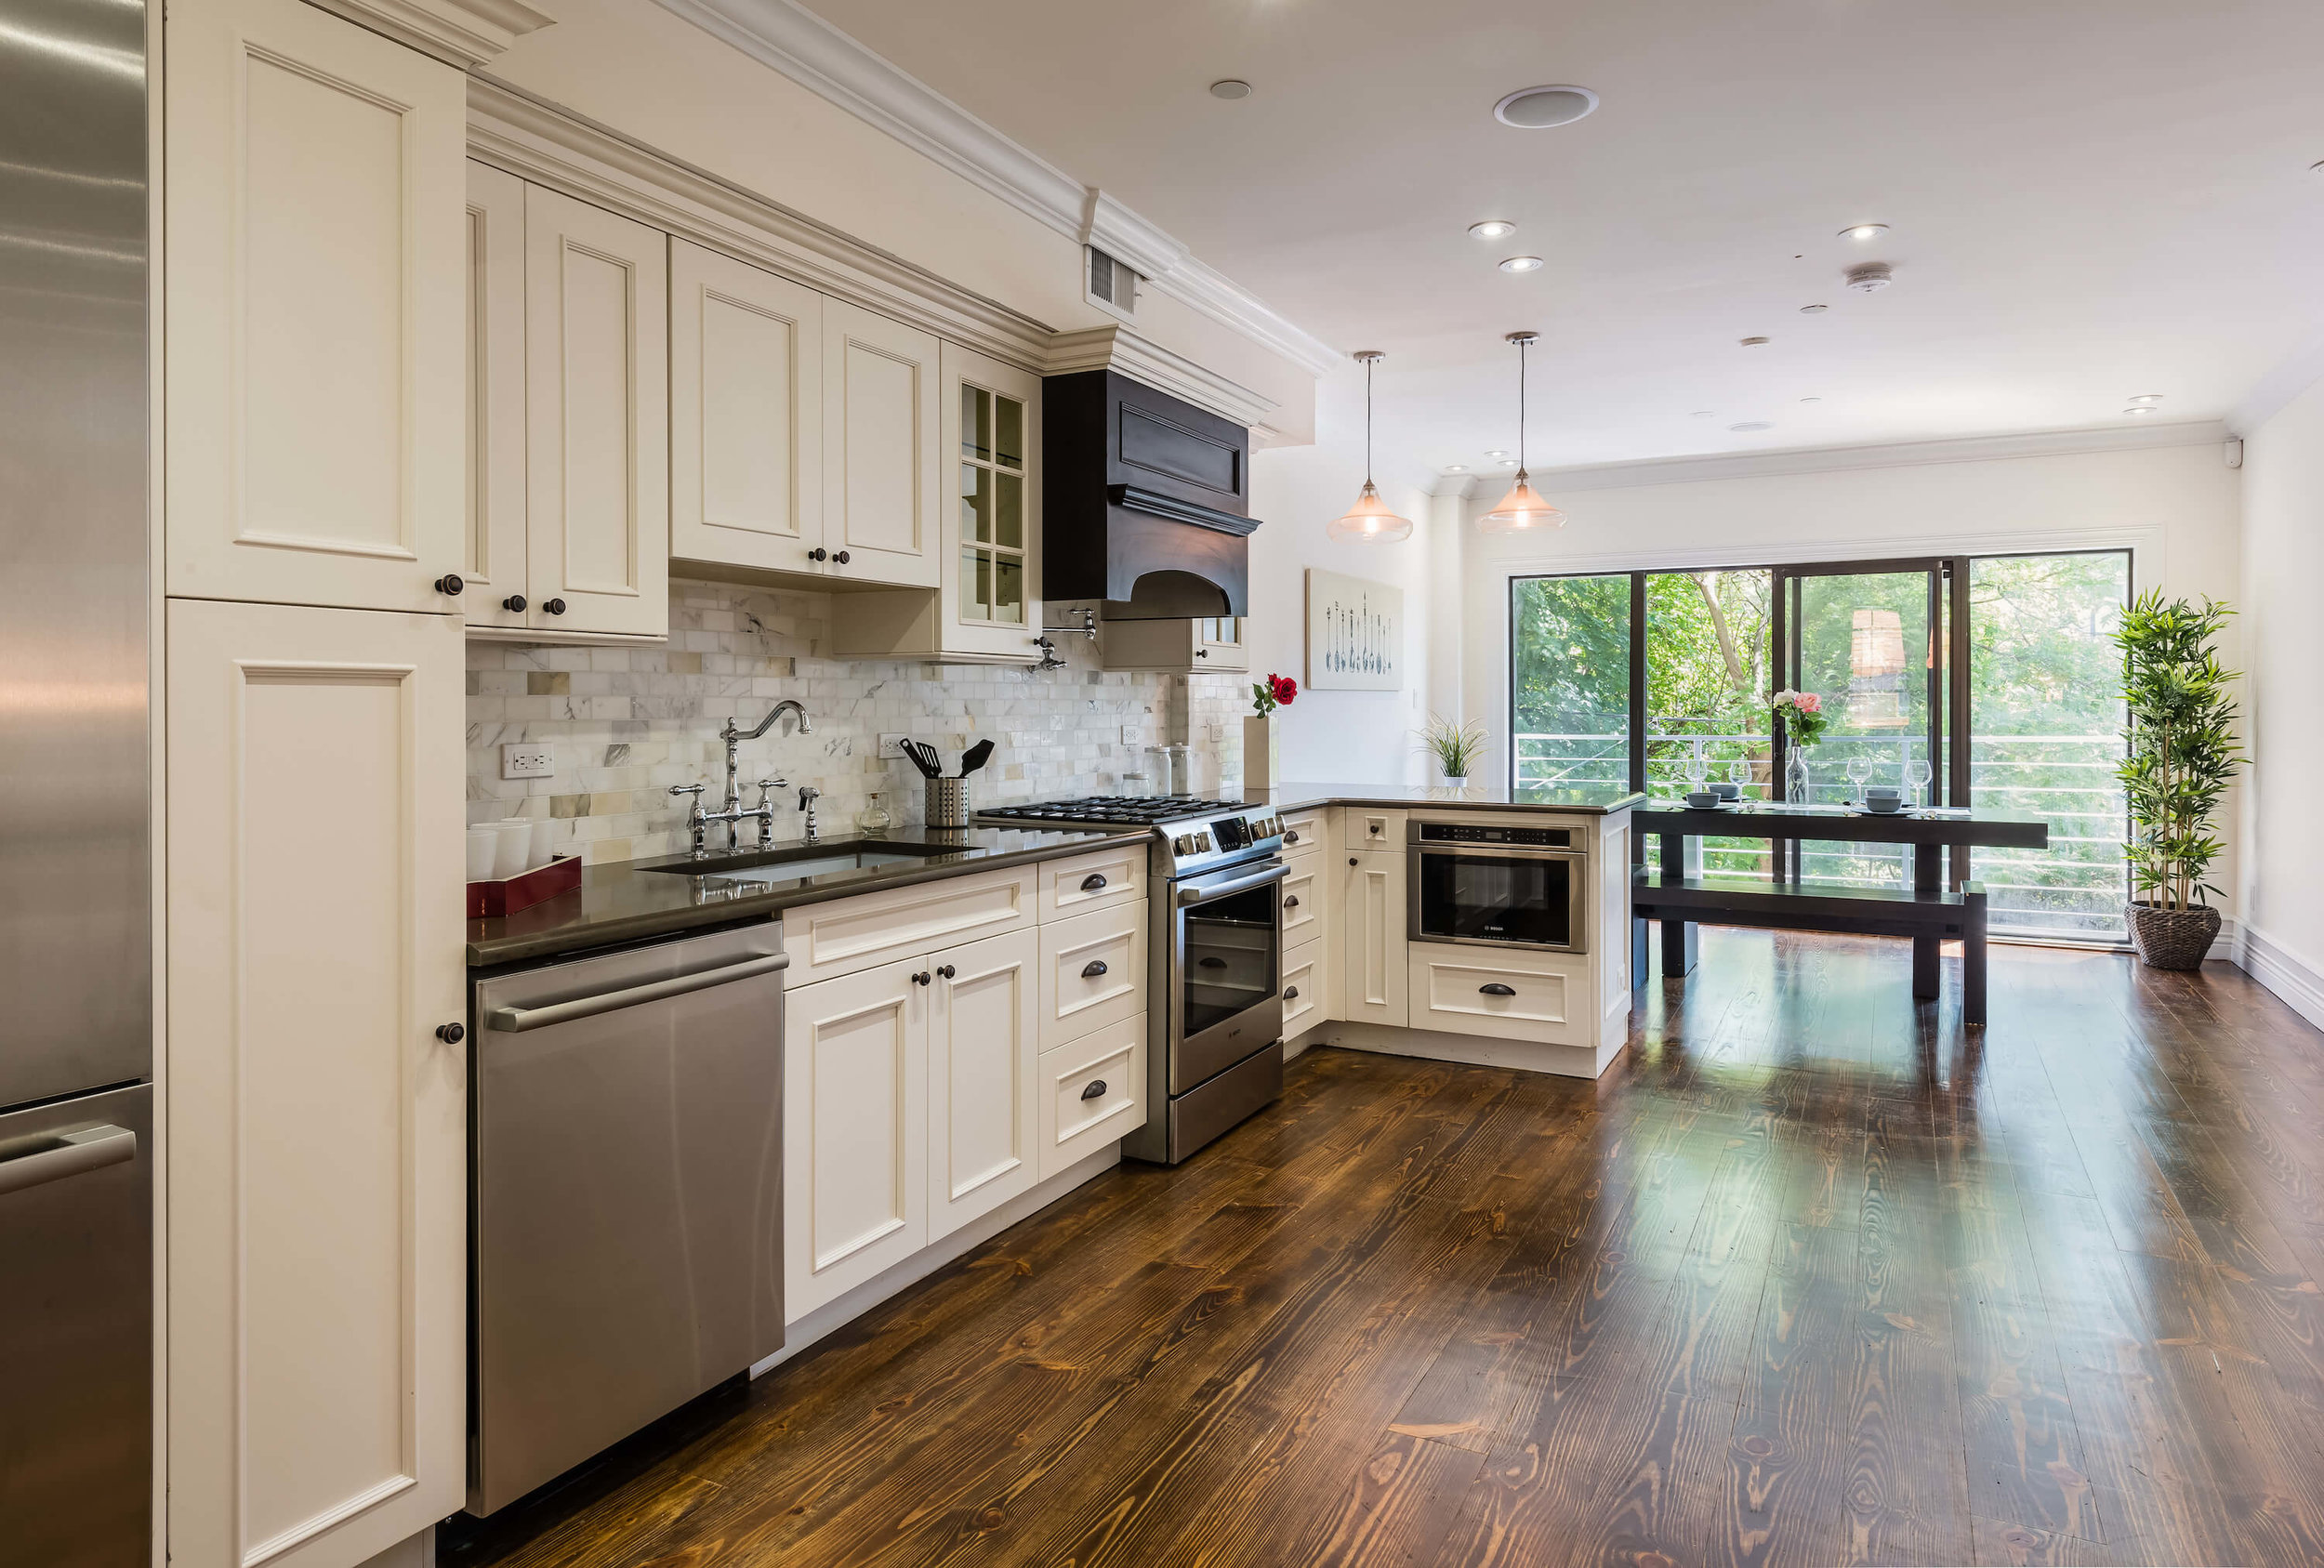 Rustic, Homey Kitchen